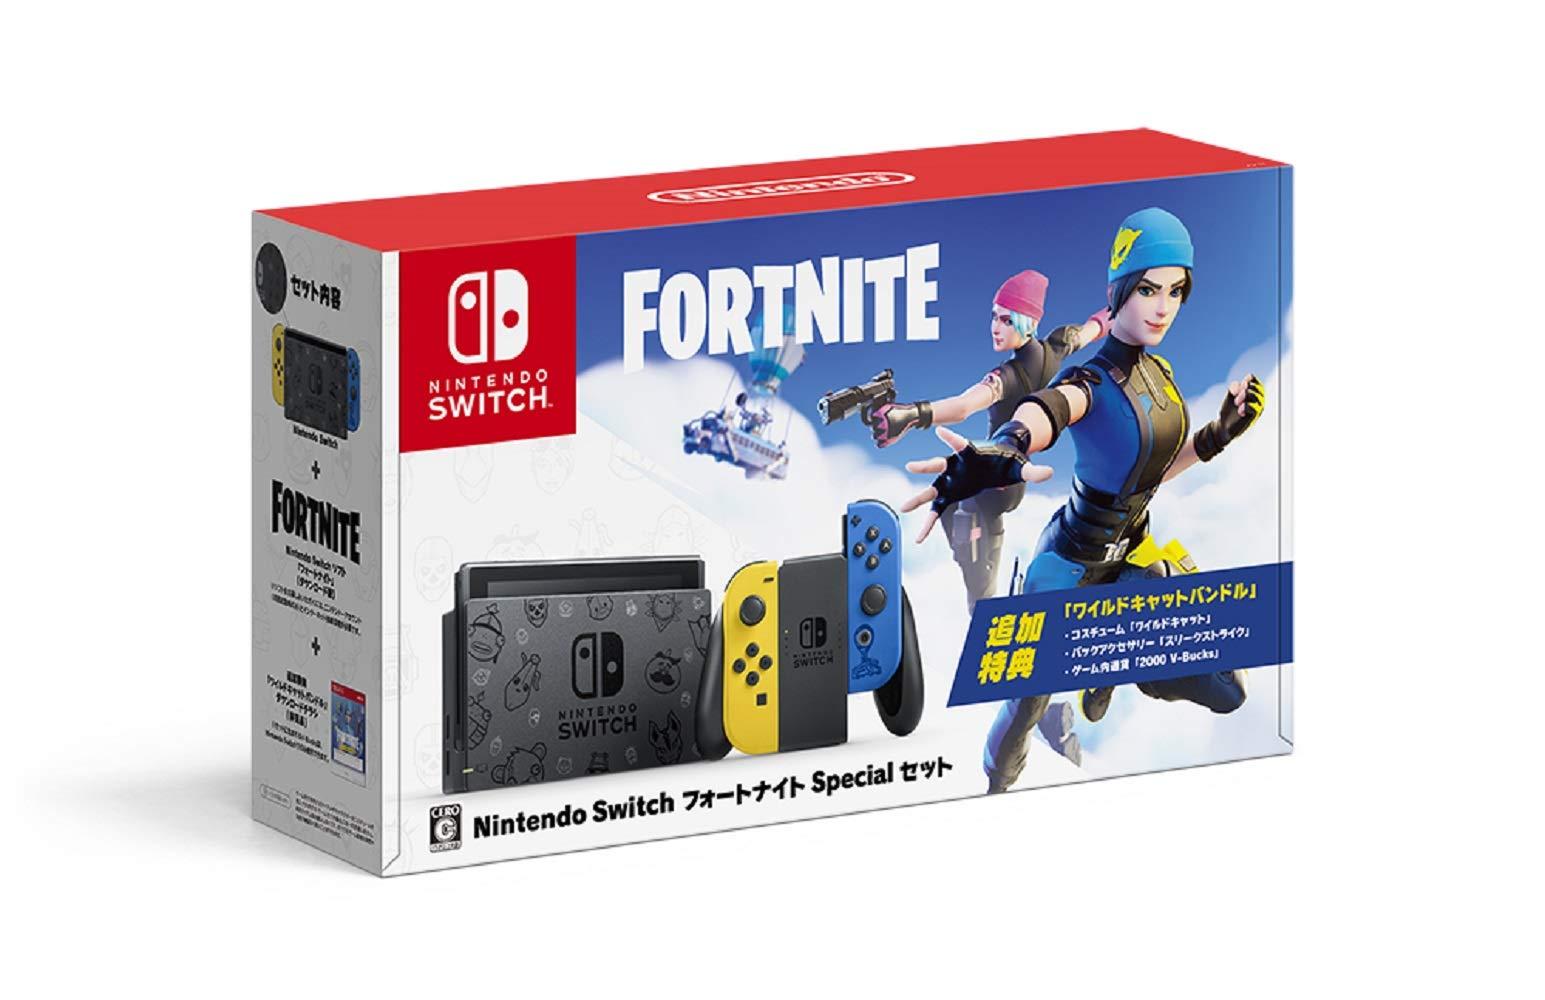 「Nintendo Switch本体 どうぶつの森セット」「Nintendo Switch本体 フォートナイトセット」の抽選販売【ゲオ】